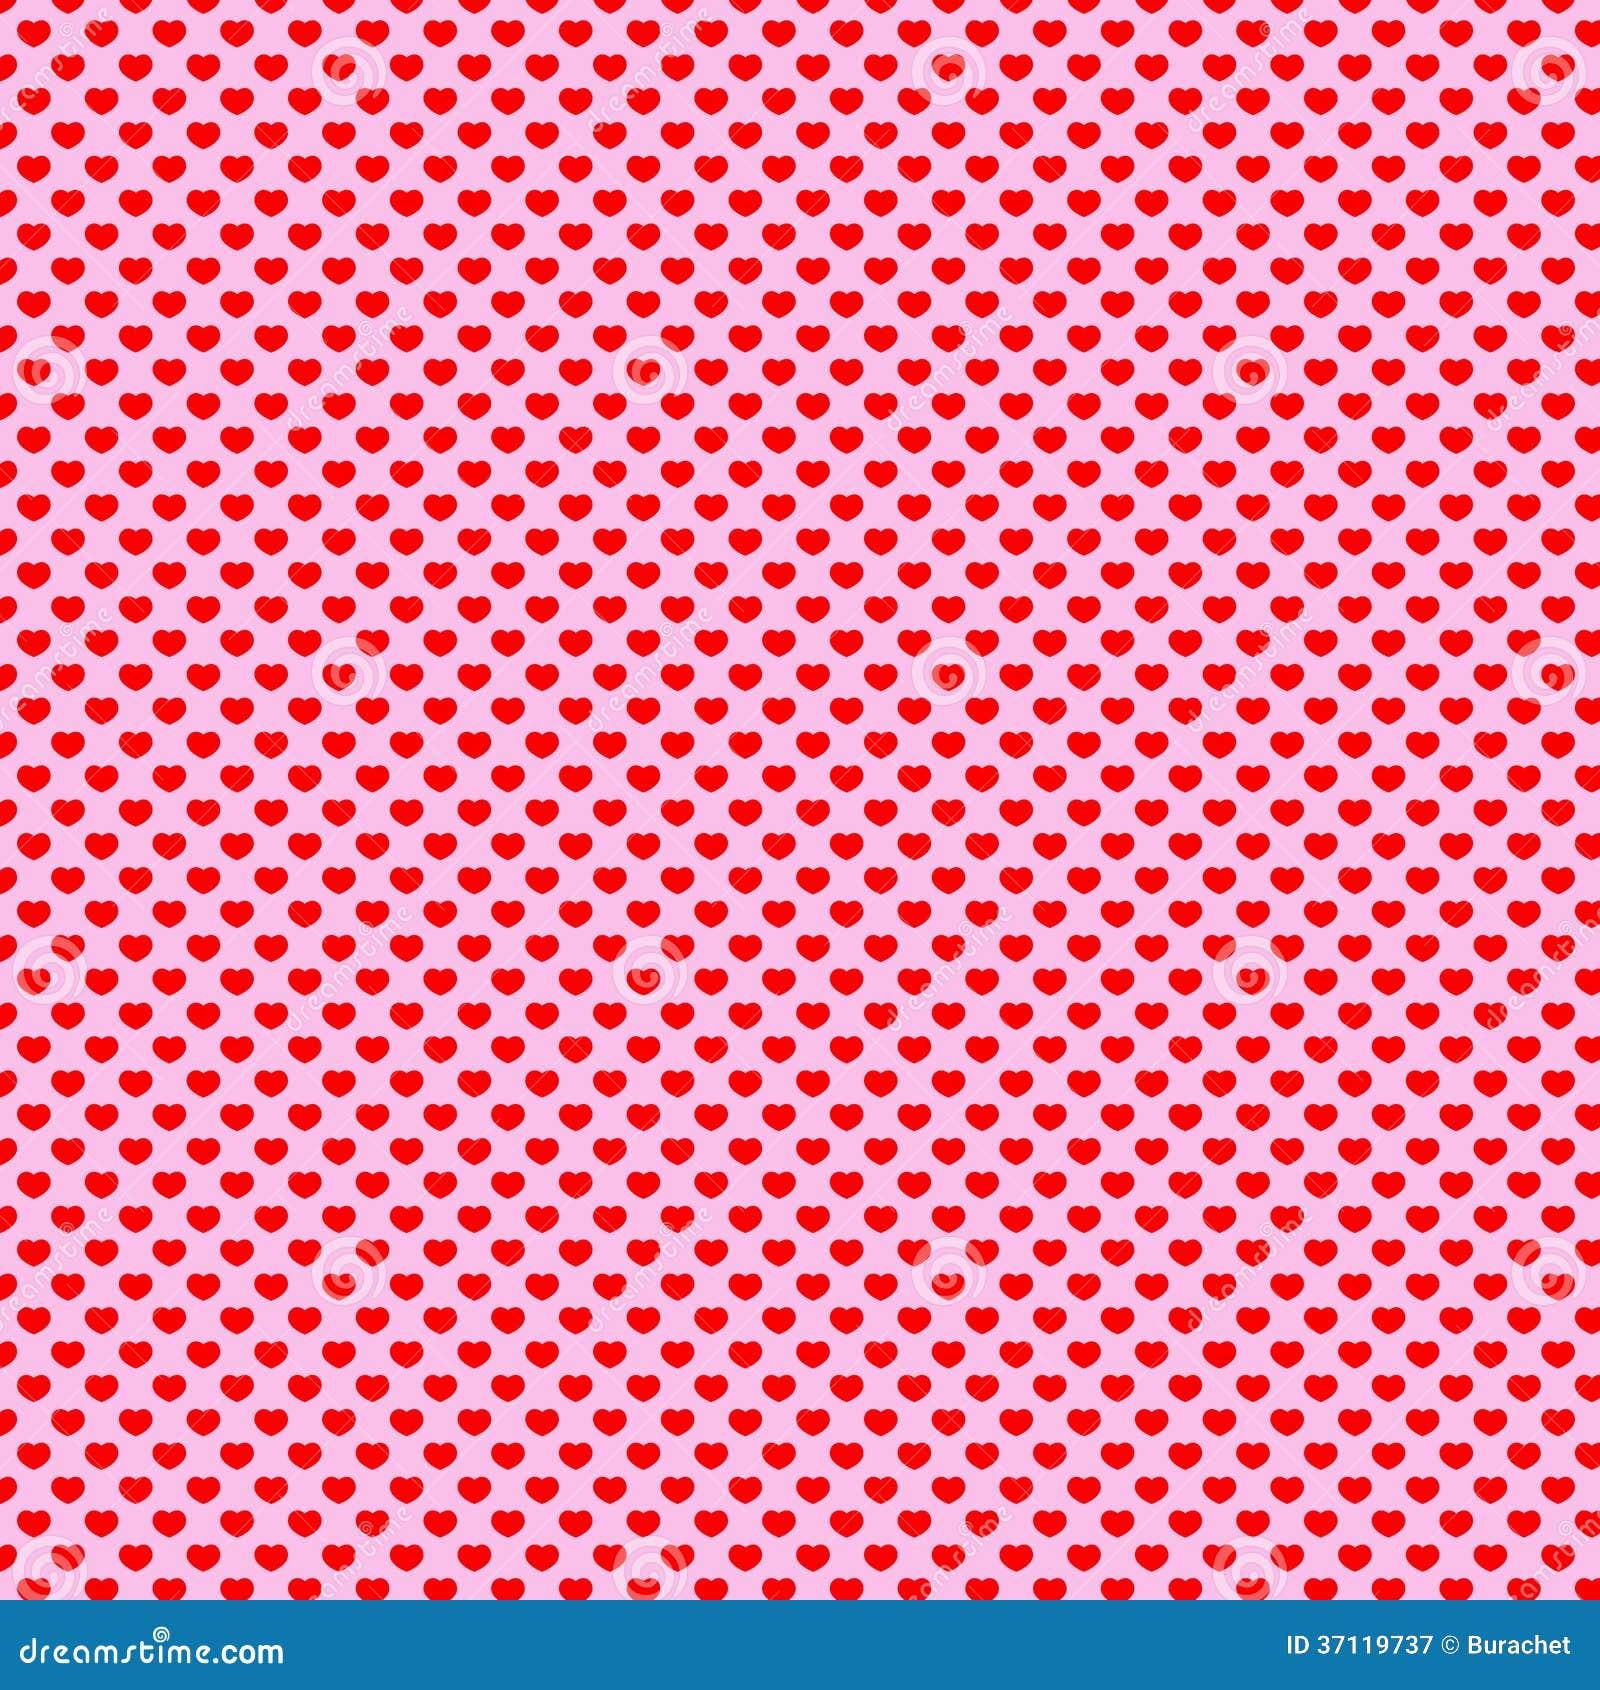 pink polka dot pattern background